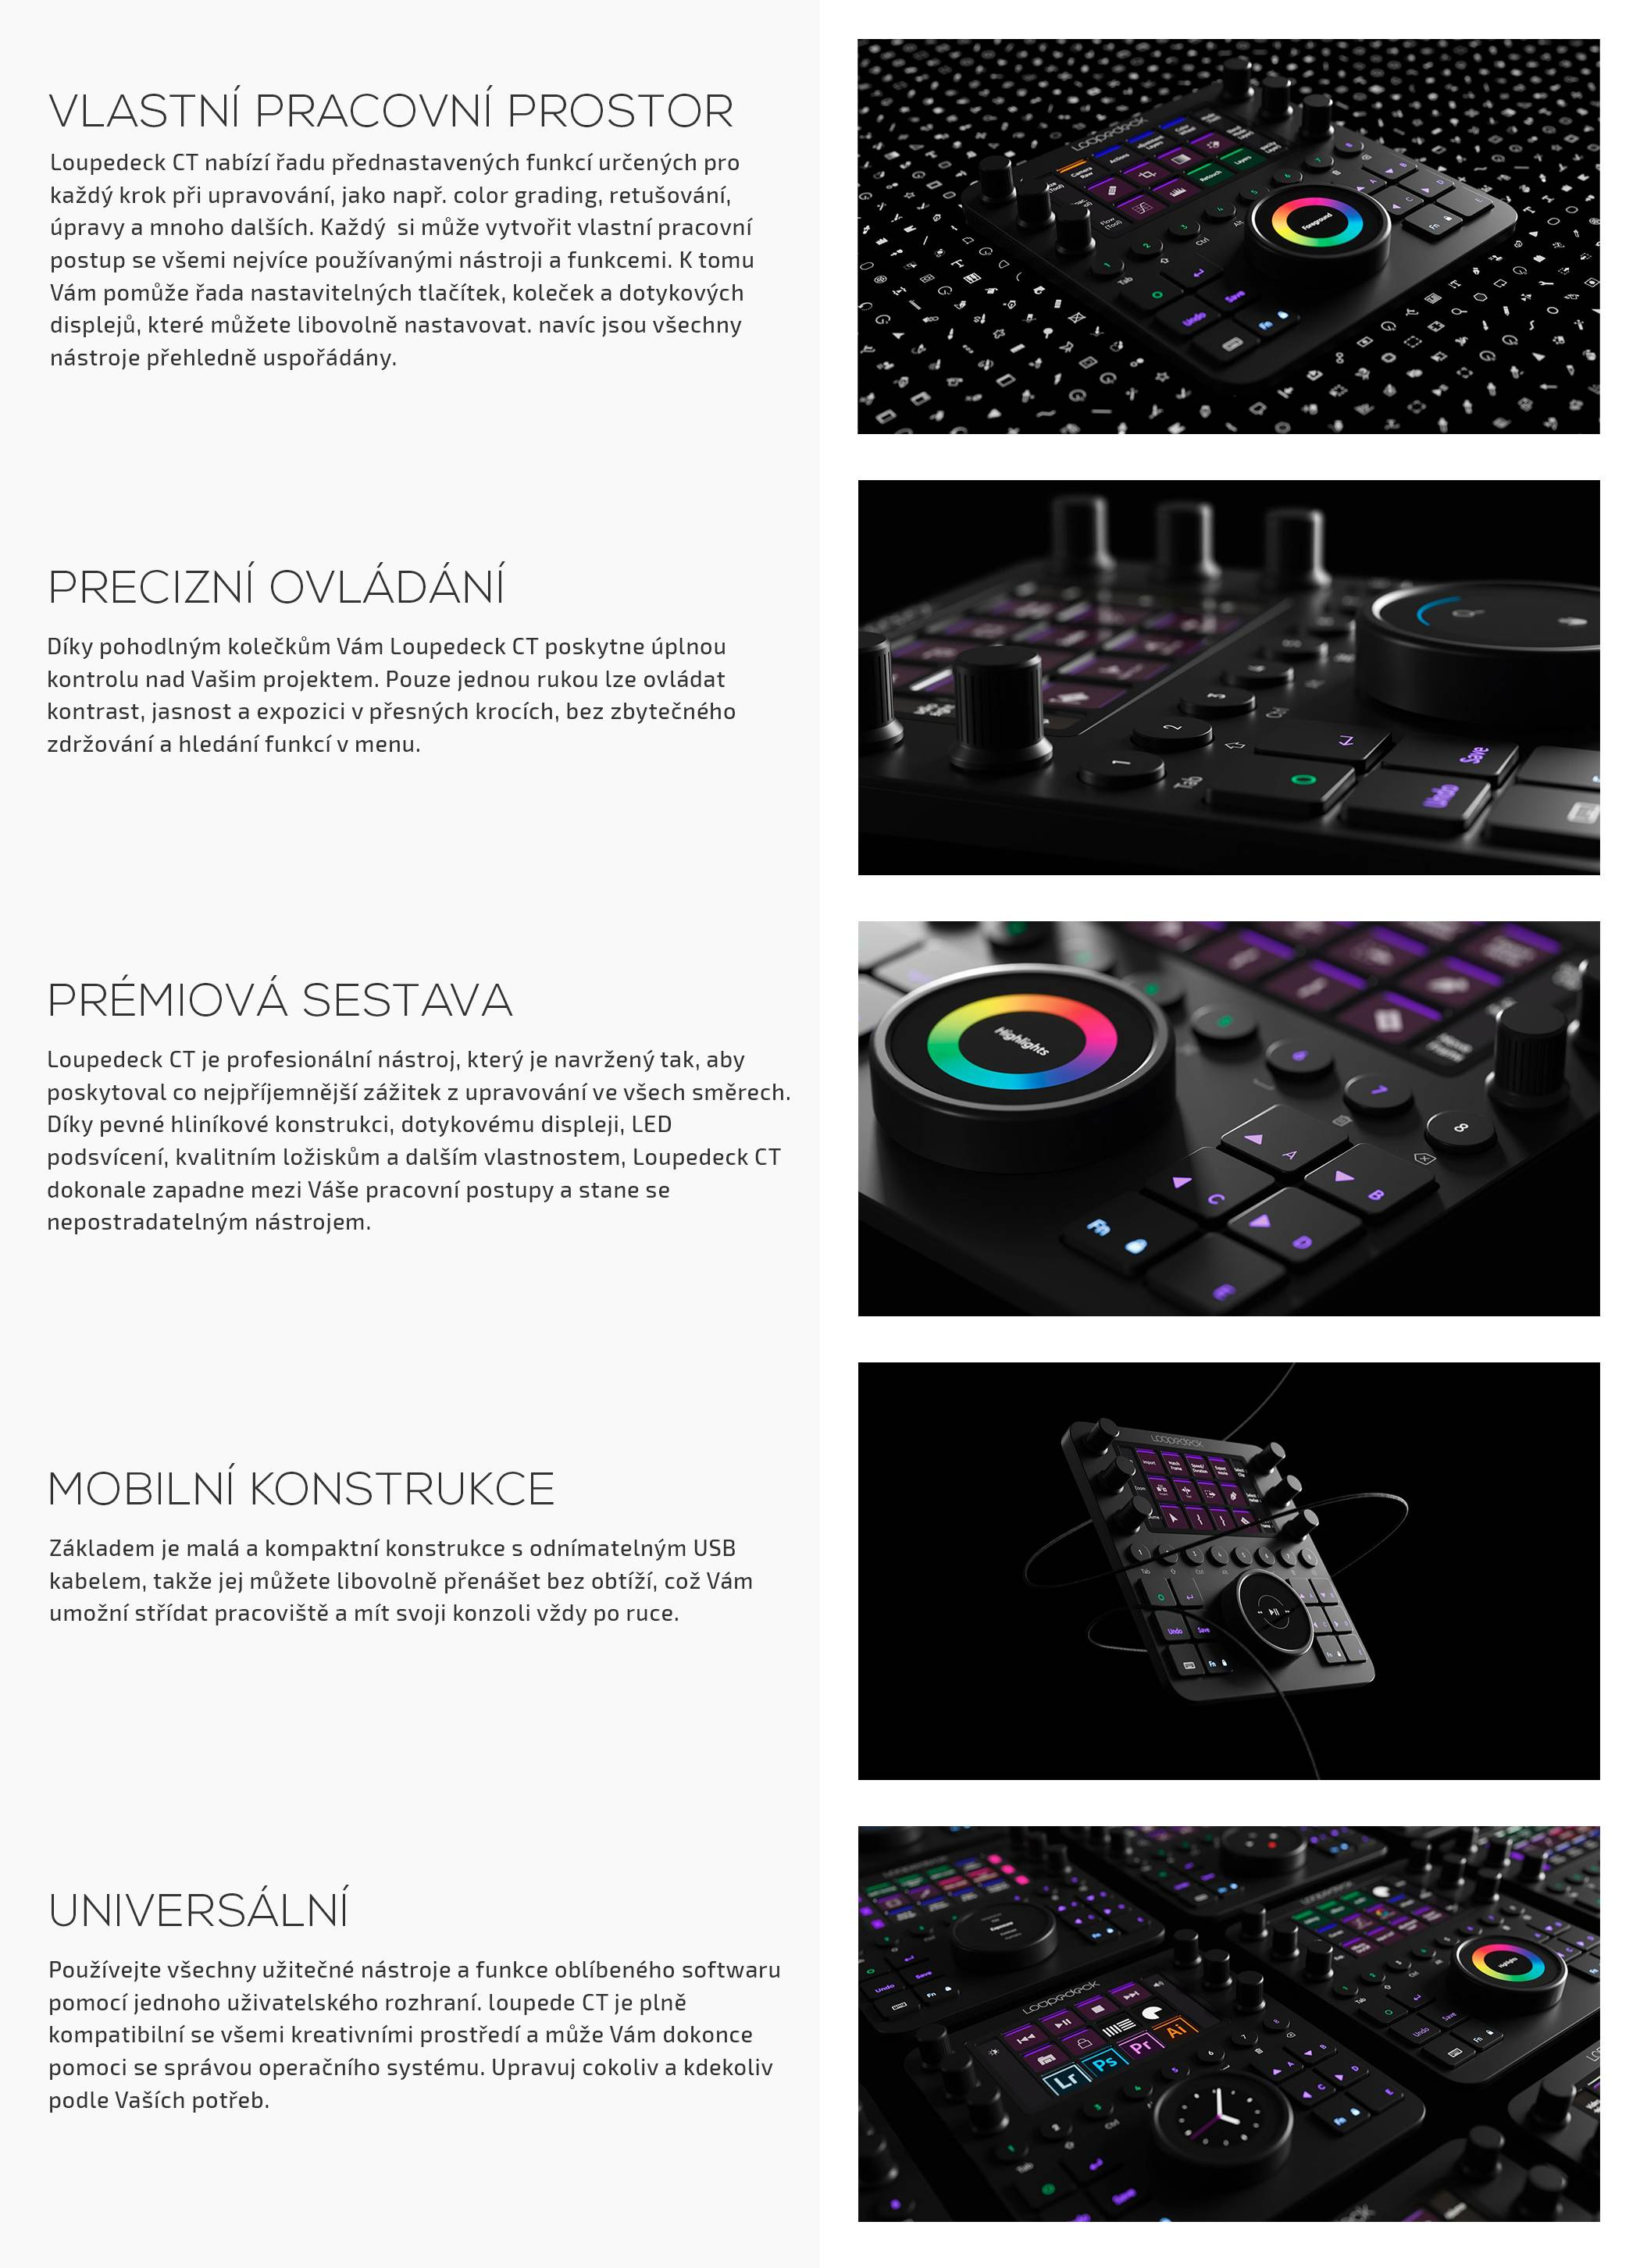 film-technika-loupedeck-creative-tool-editační-konzole-vlastnosti